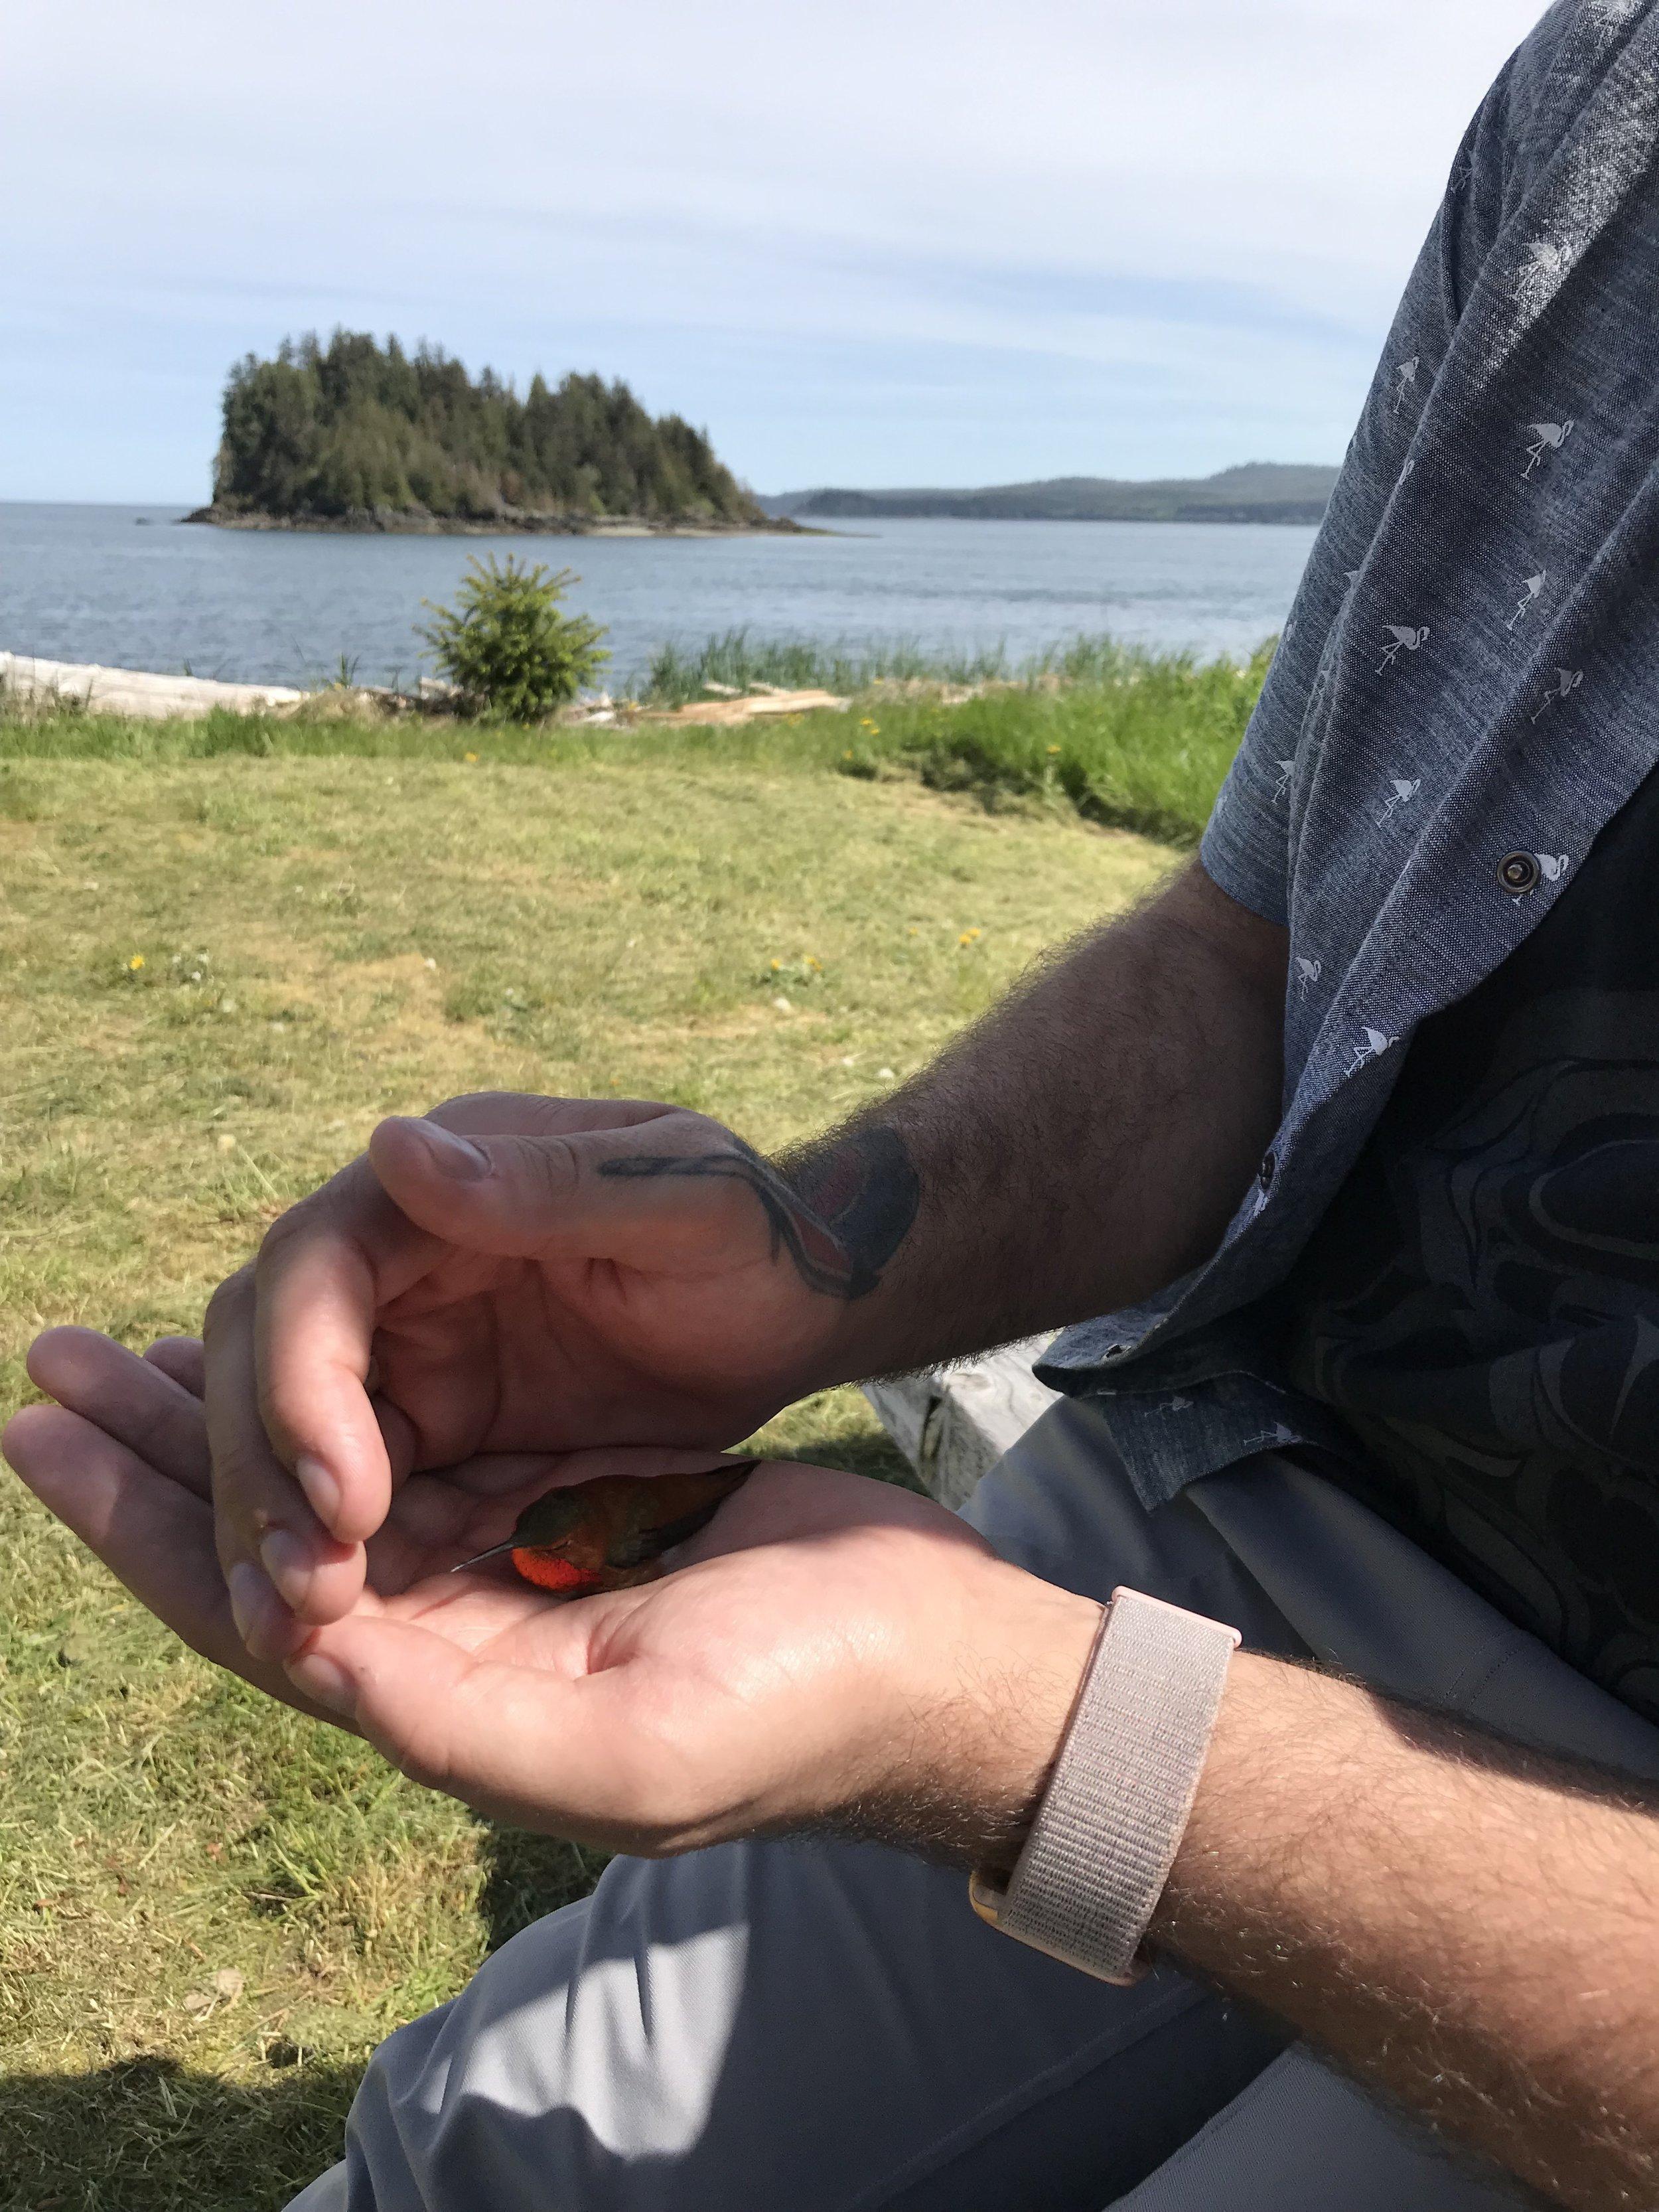 Patrick saved the humming bird!